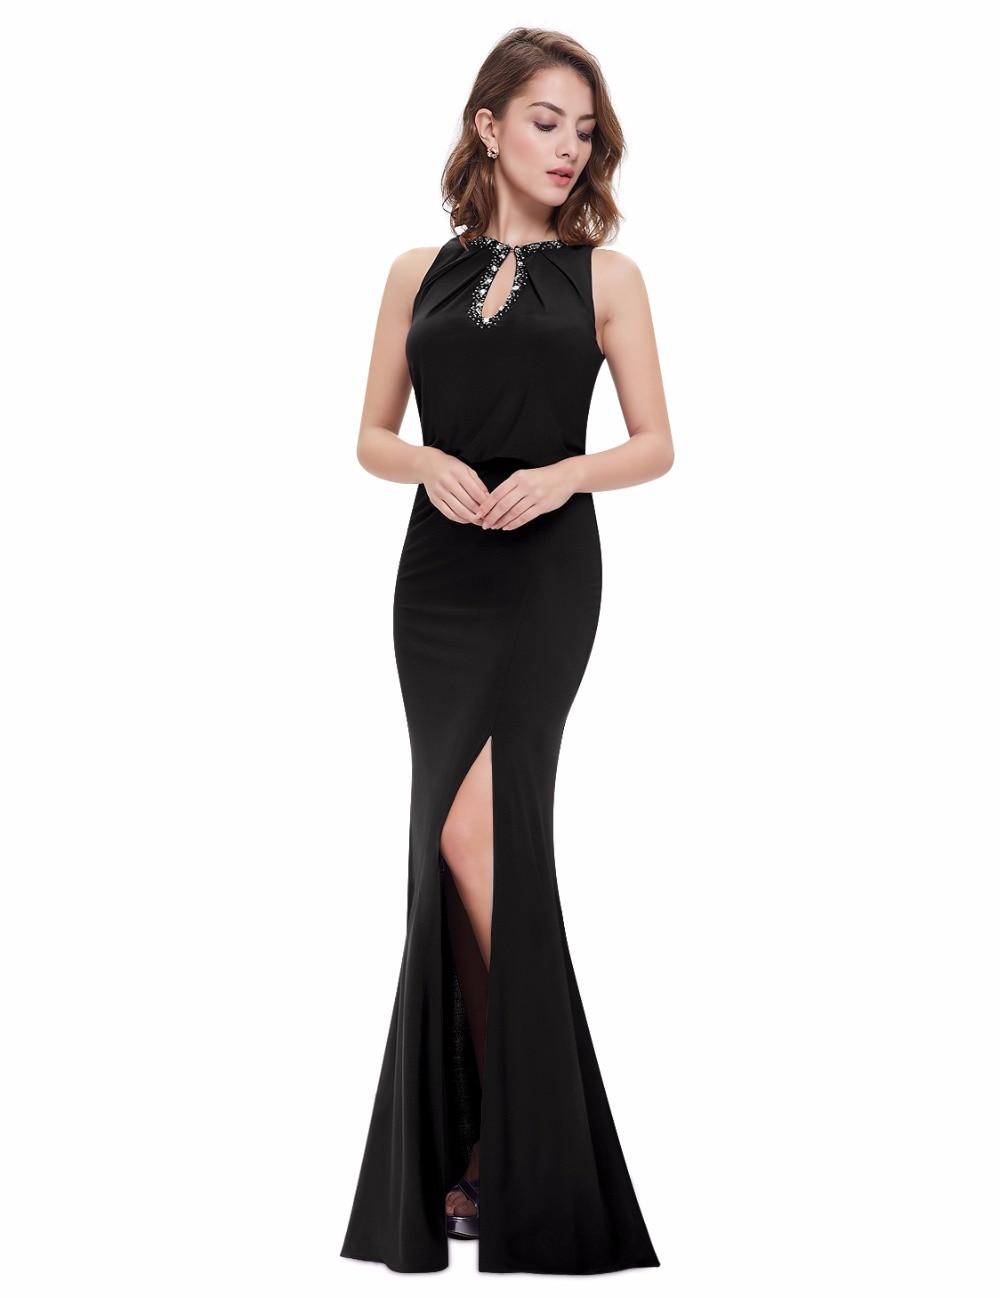 [Clearance Sale] Ever Pretty Women Vintage Evening Dresses A Line Elegant Sleeveless Side Split Formal Party Evening Dress